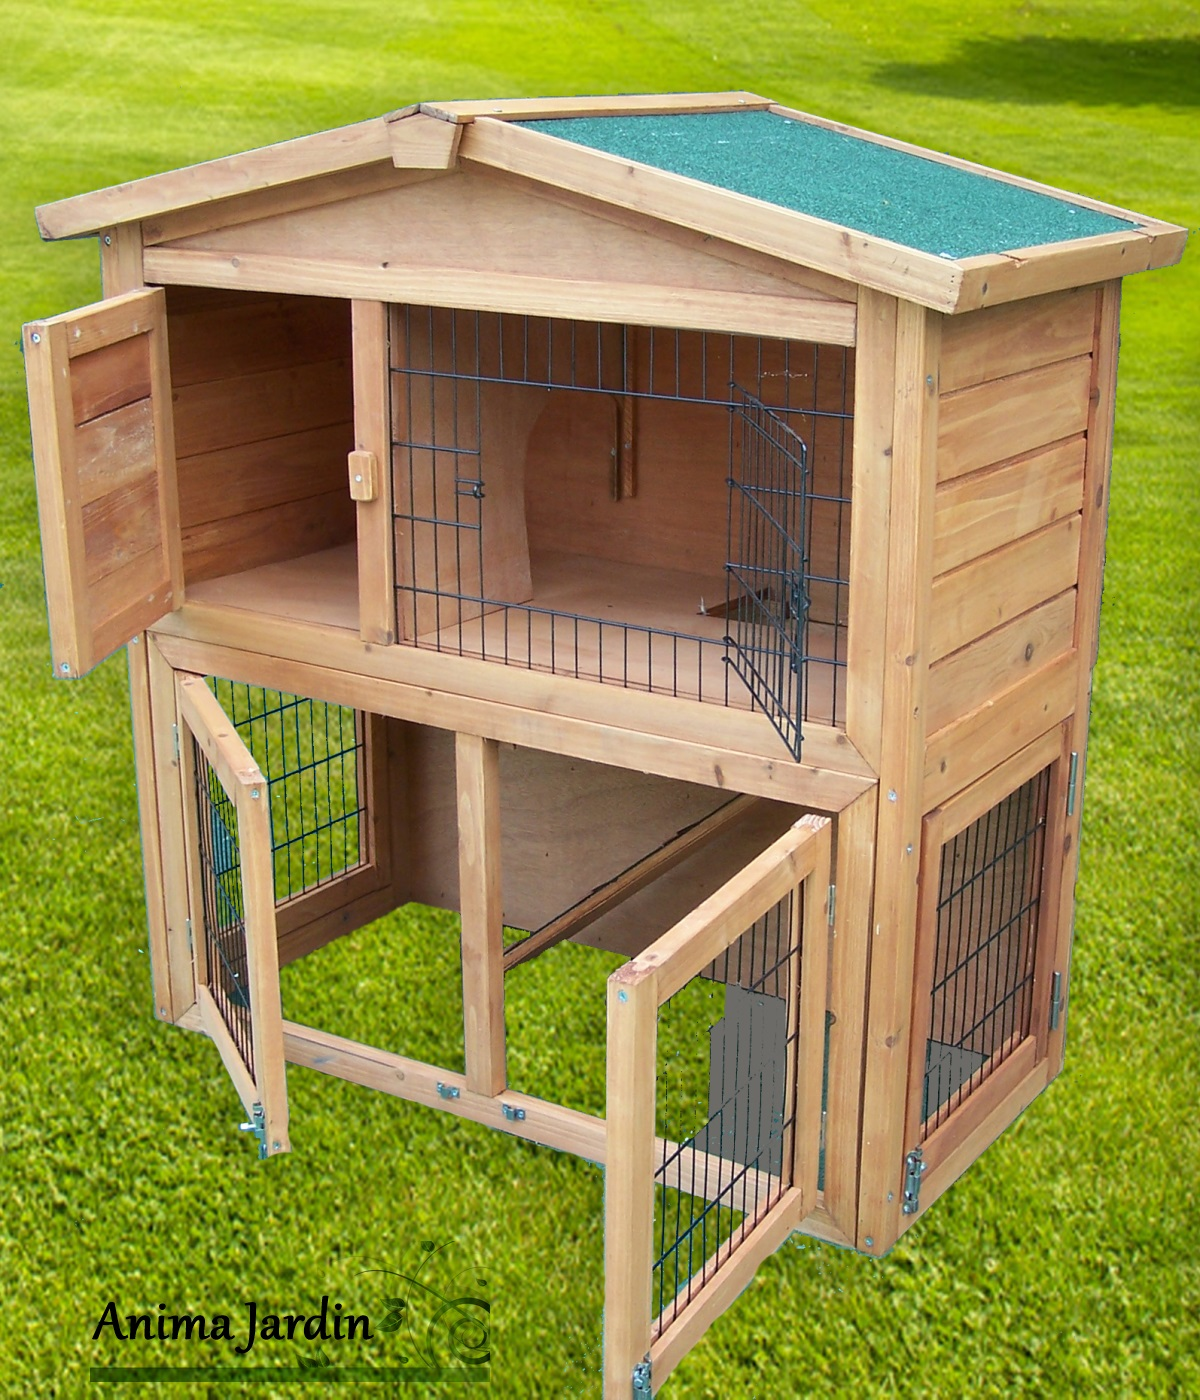 cage rongeur pas cher accessoire masse ratire nasse rats pige souris rongeurs cage nu with cage. Black Bedroom Furniture Sets. Home Design Ideas